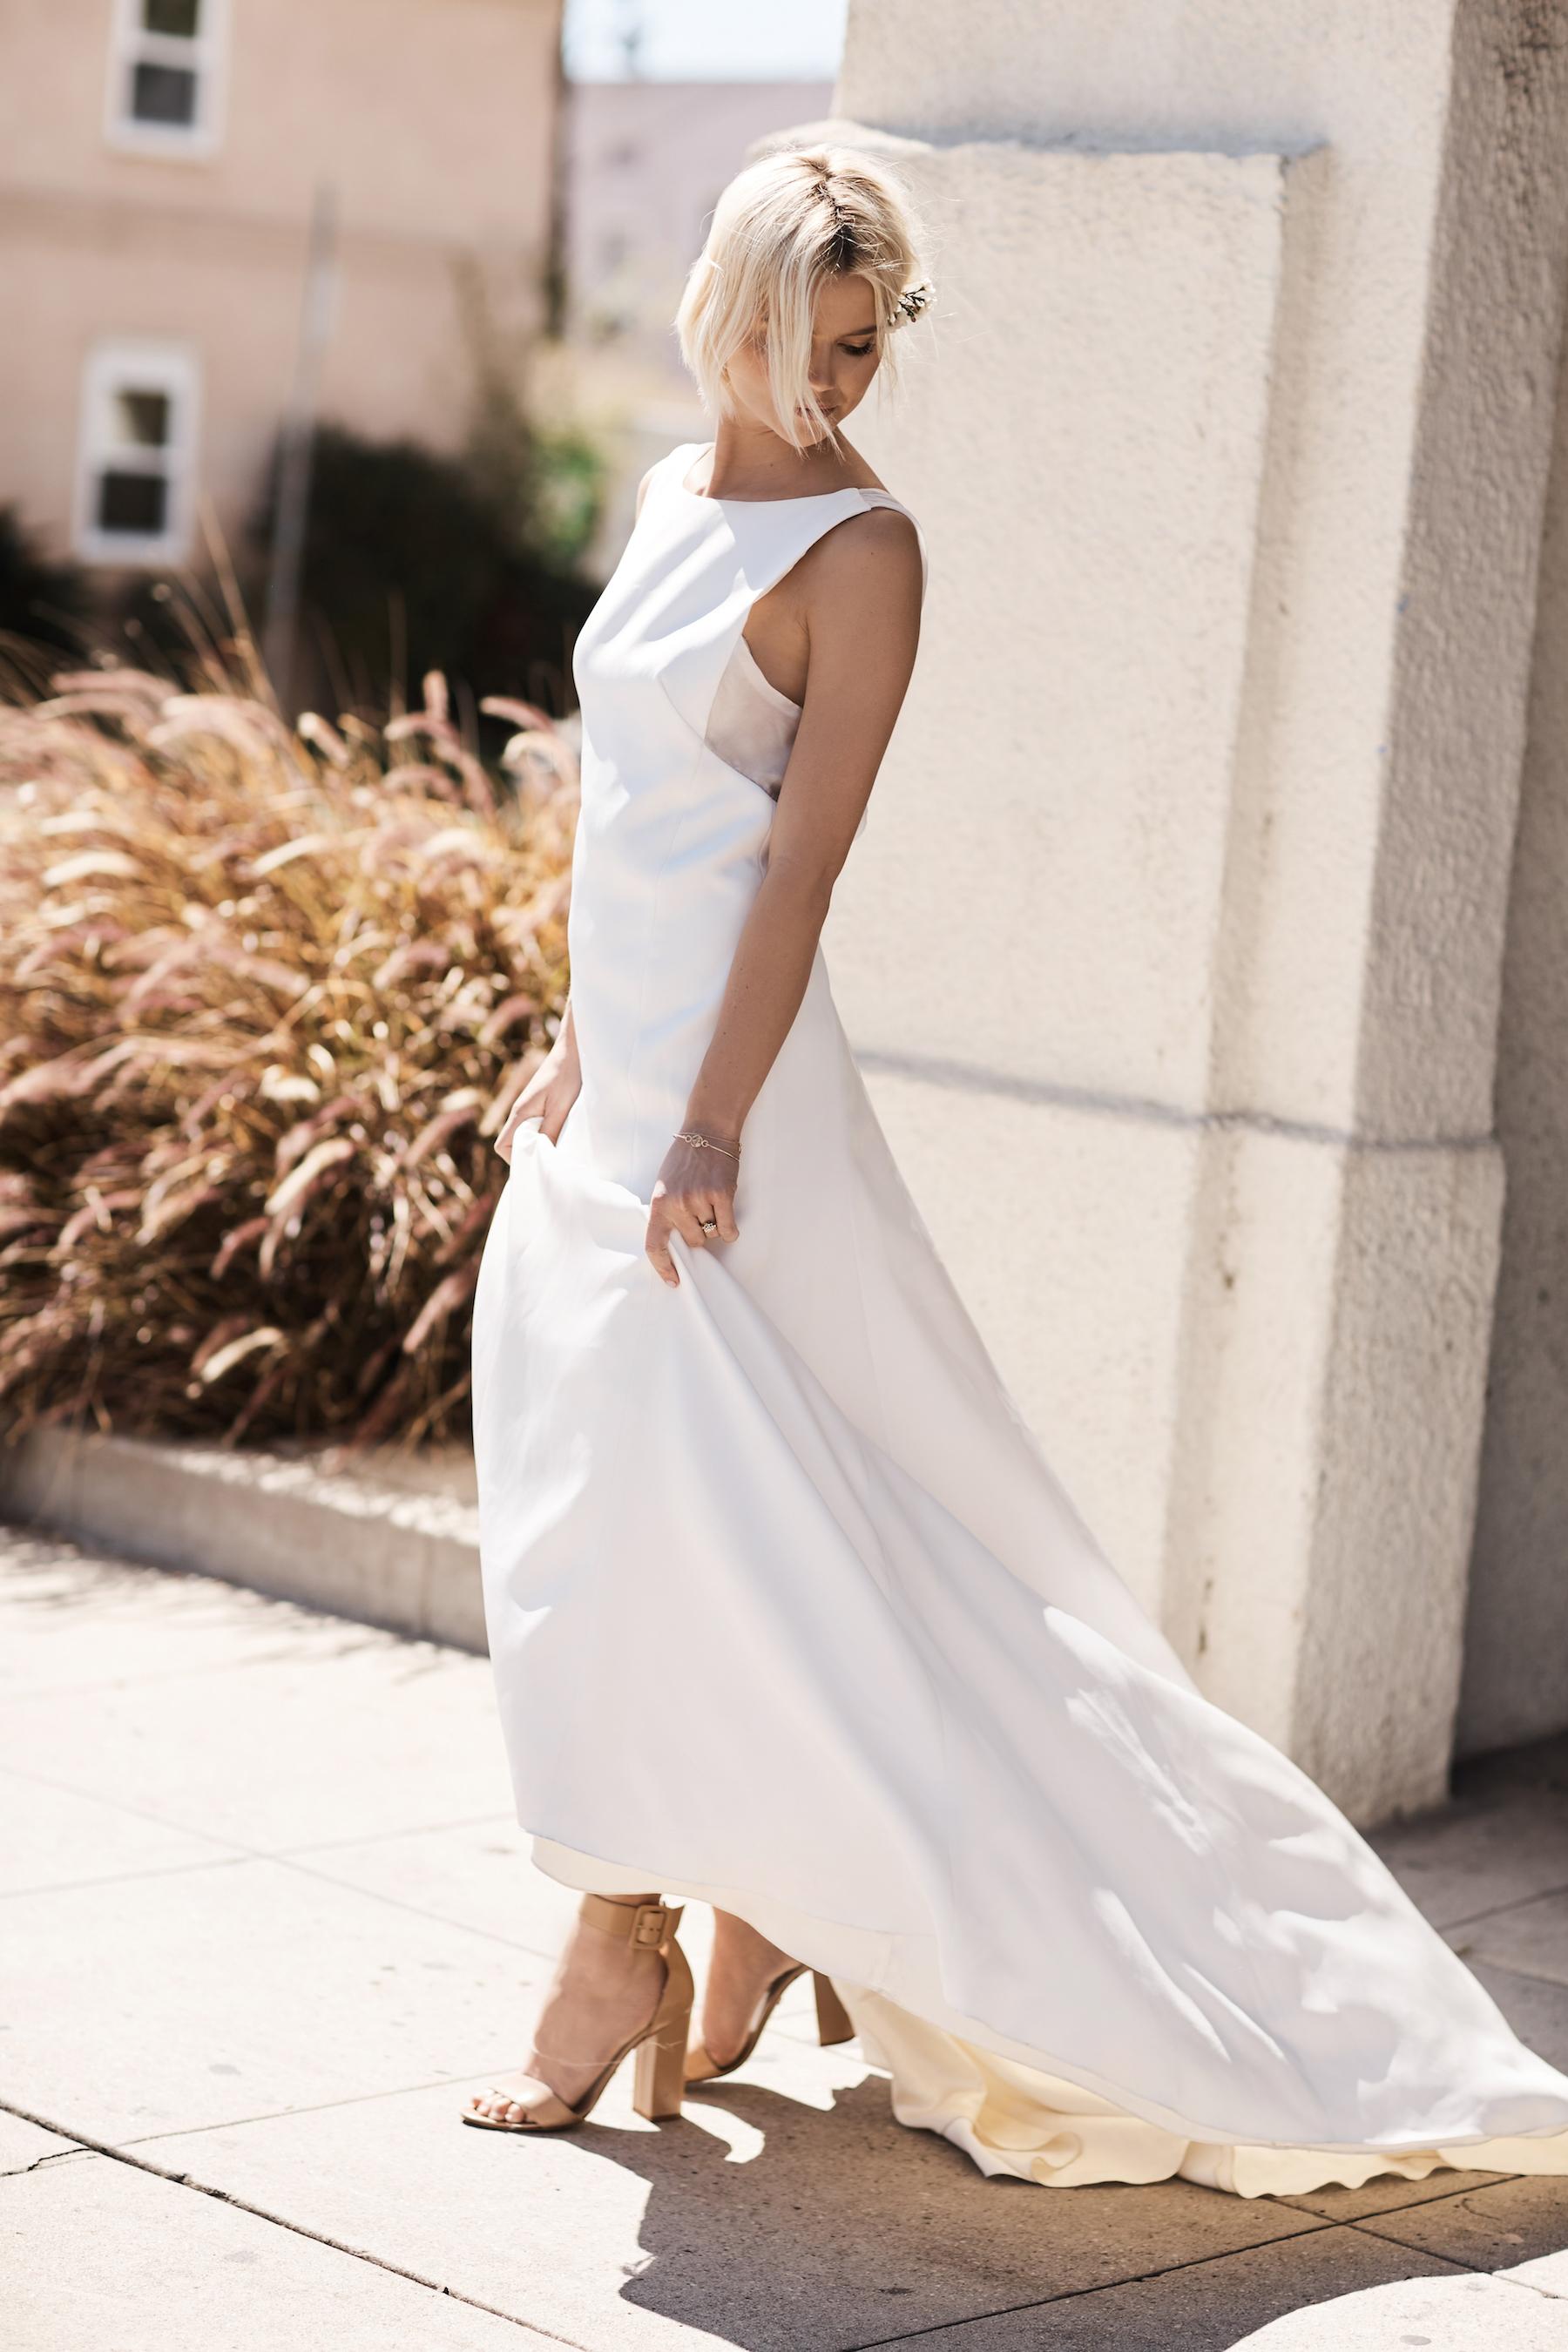 Wedding Dresses Zulily – Fashion dresses